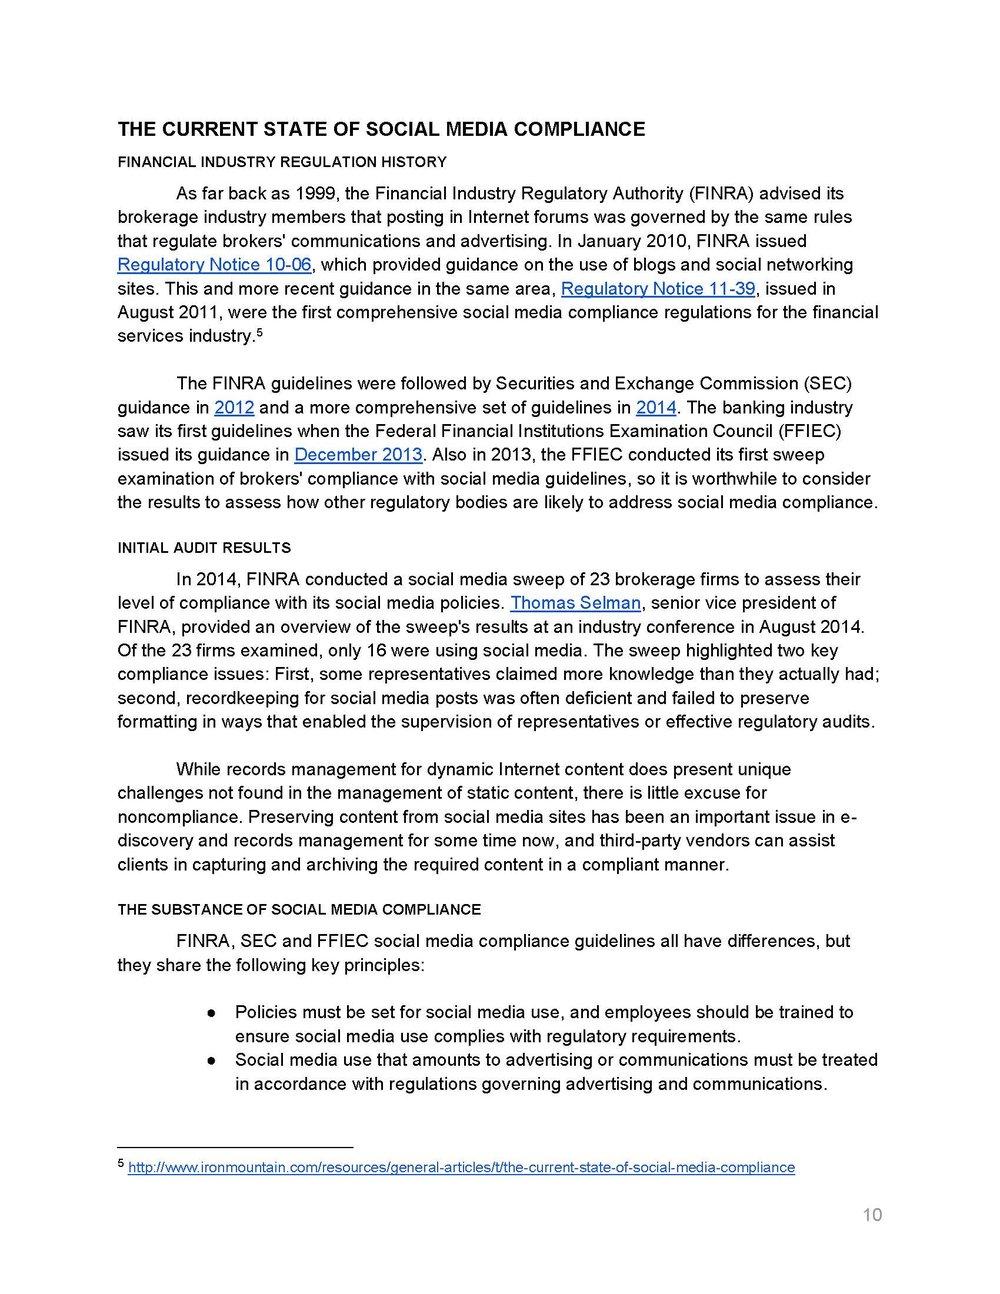 Amity Financial - Social Media White Paper_Page_11.jpg